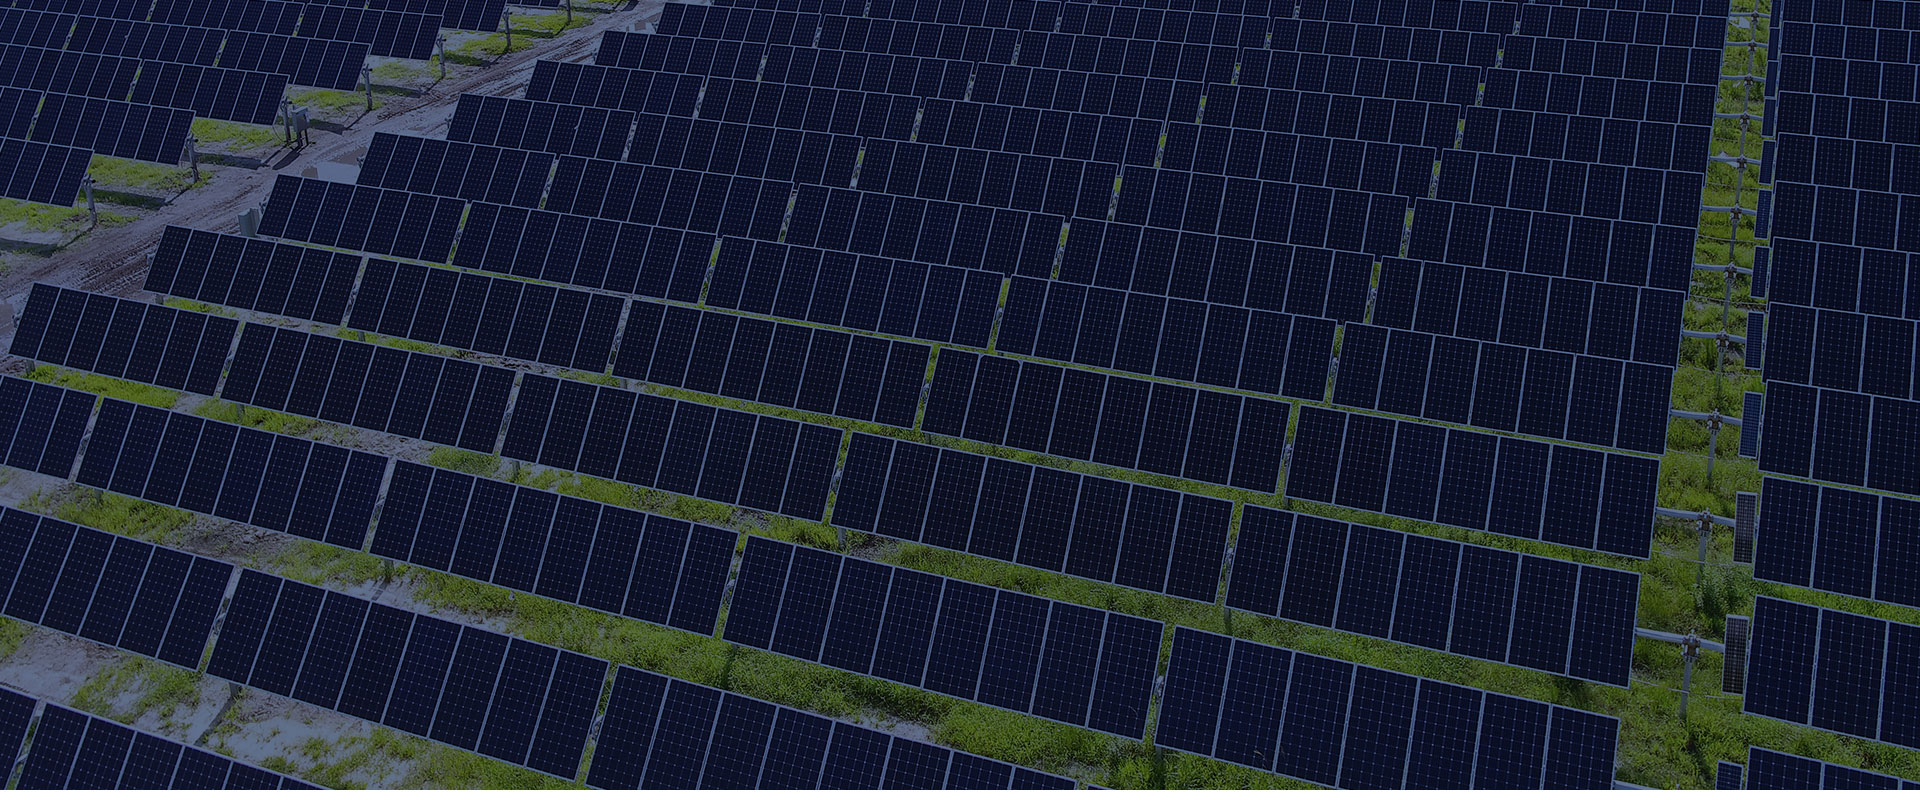 Trackers Vanguard de Trina Solar reciben la certificación europea de calidad IEC